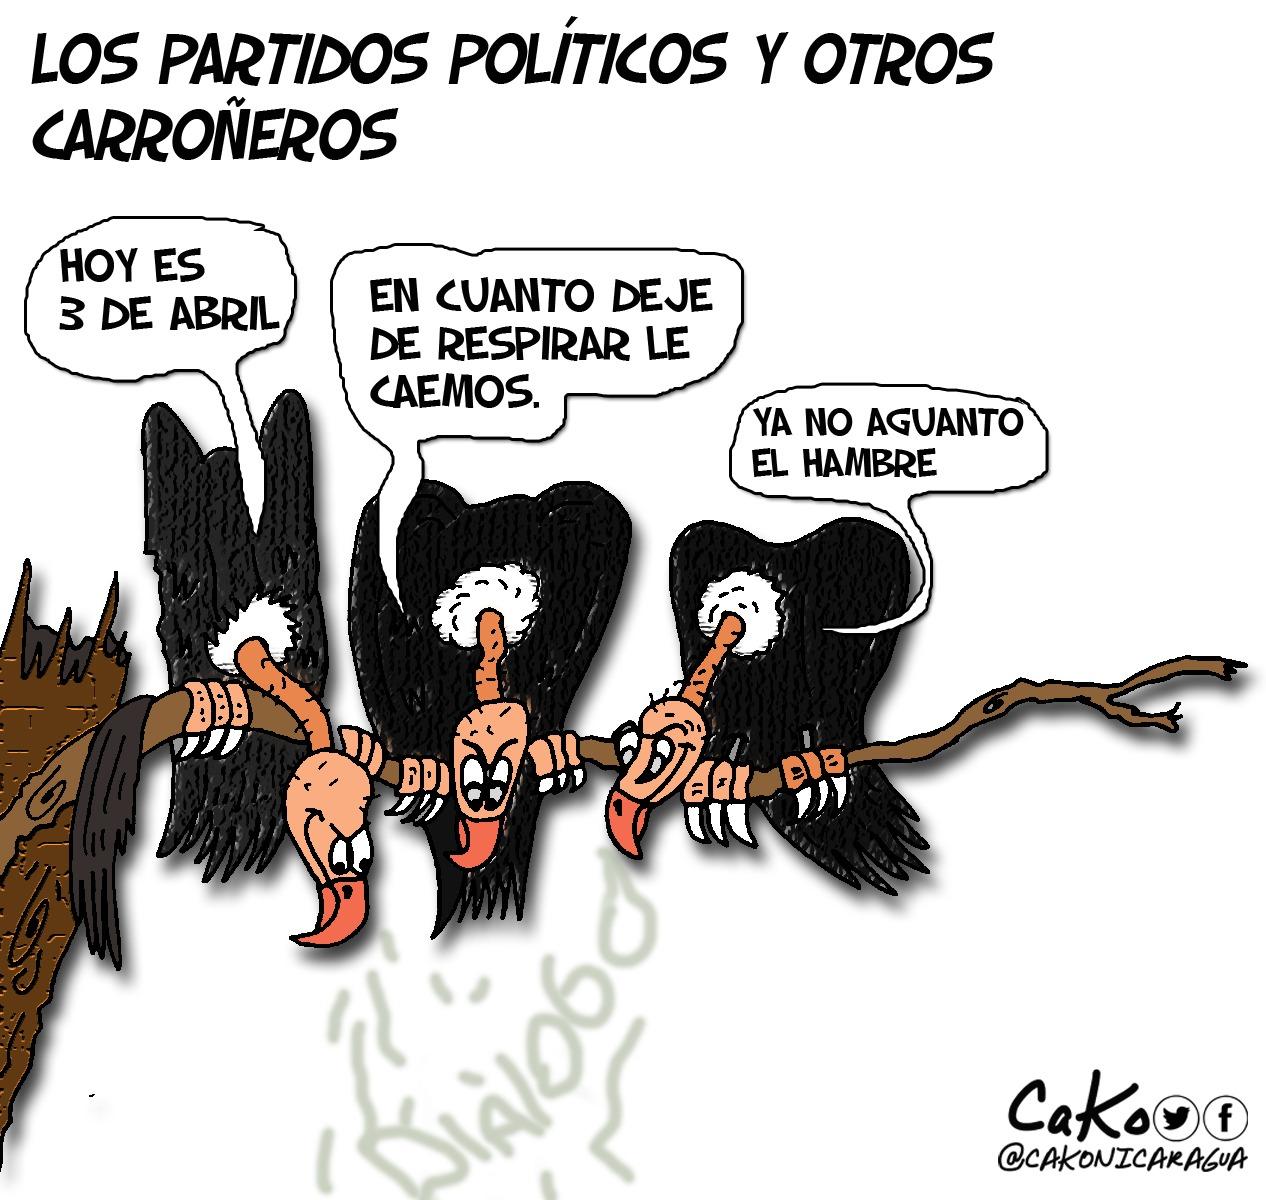 La Caricatura: Aves de rapiña en la mesa